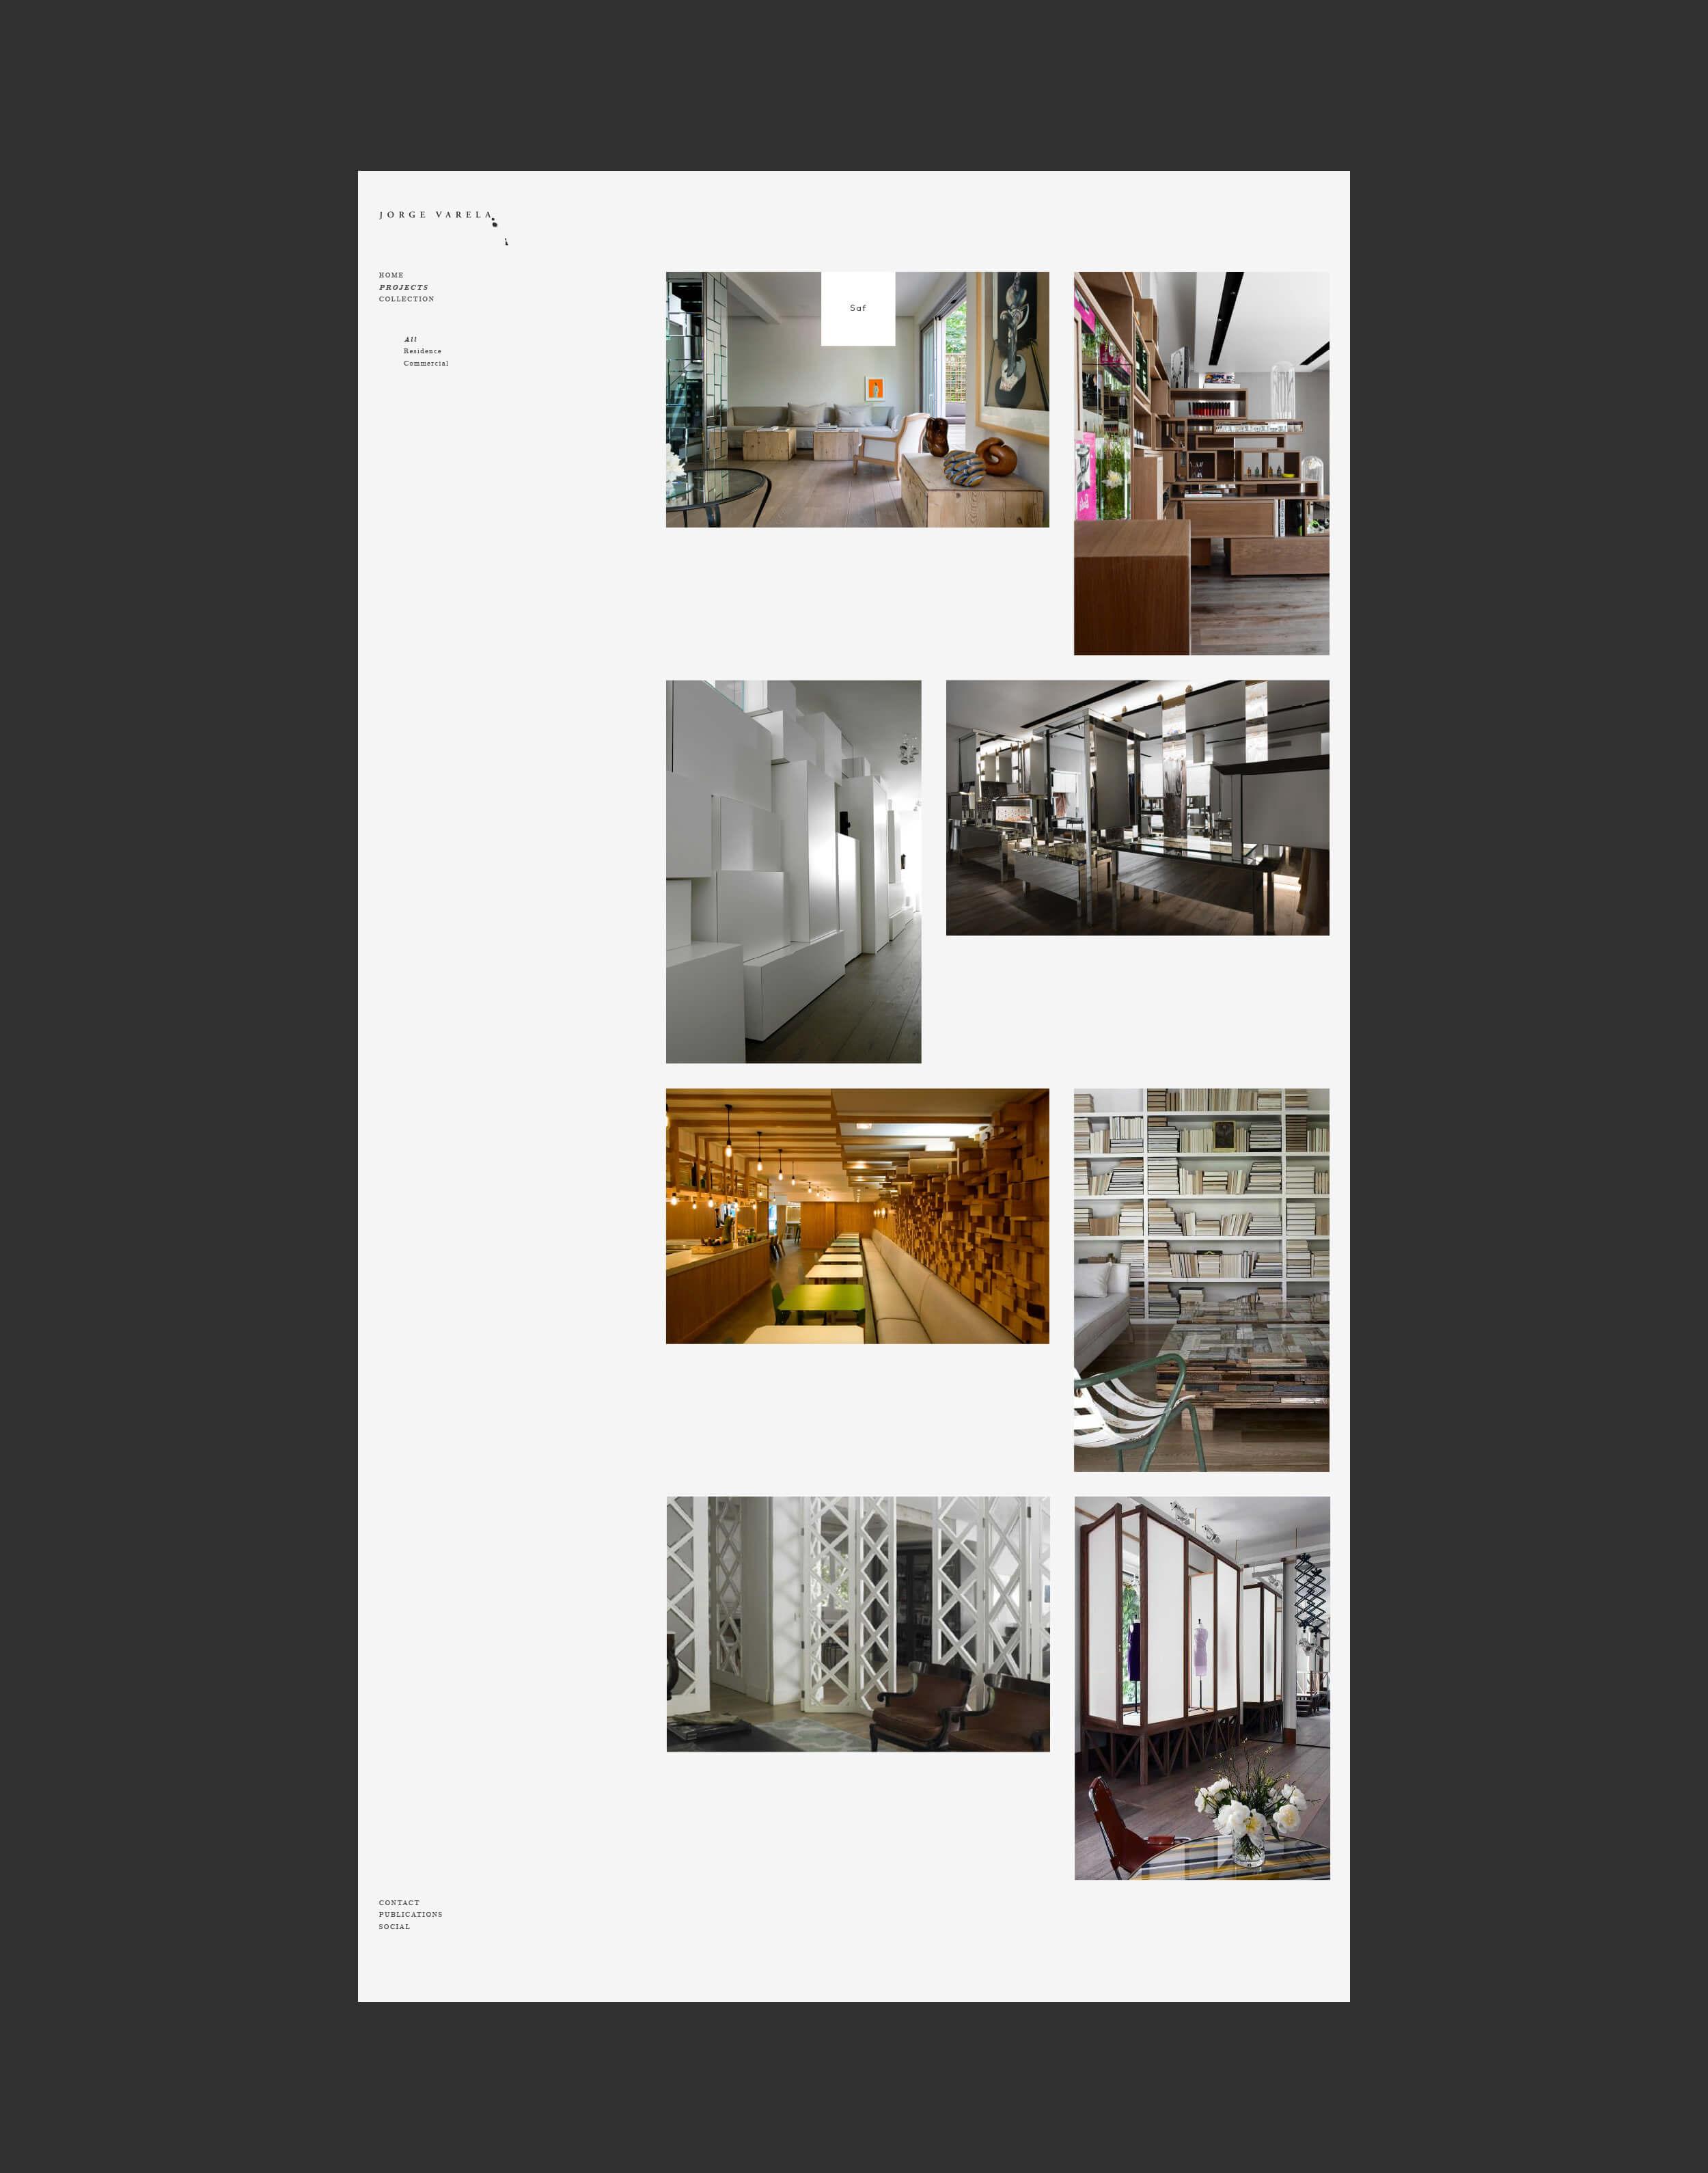 Interior de la web del interiorista Madrileño Jorge Varela